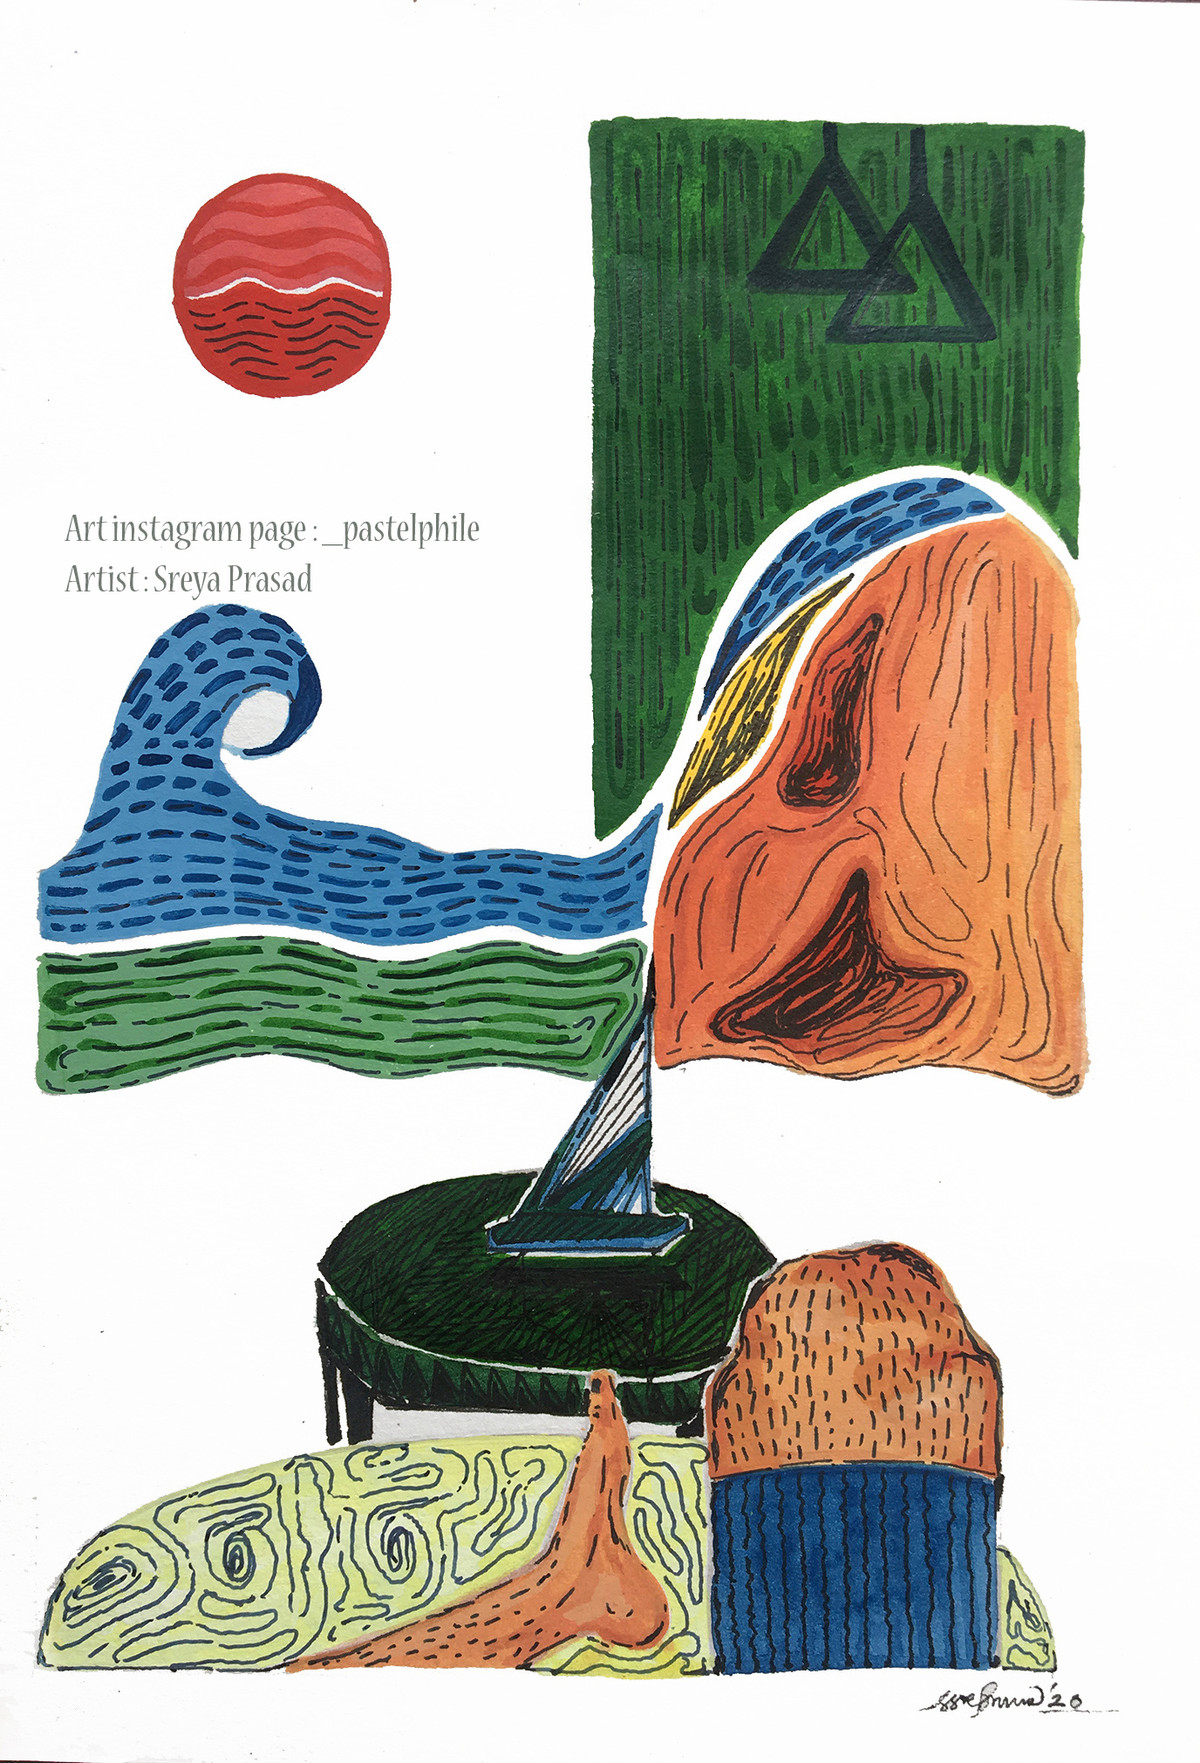 Surfing the giant life wave! The Pastelphile Beach Digital Print by Sreya Prasad ,Pop Art